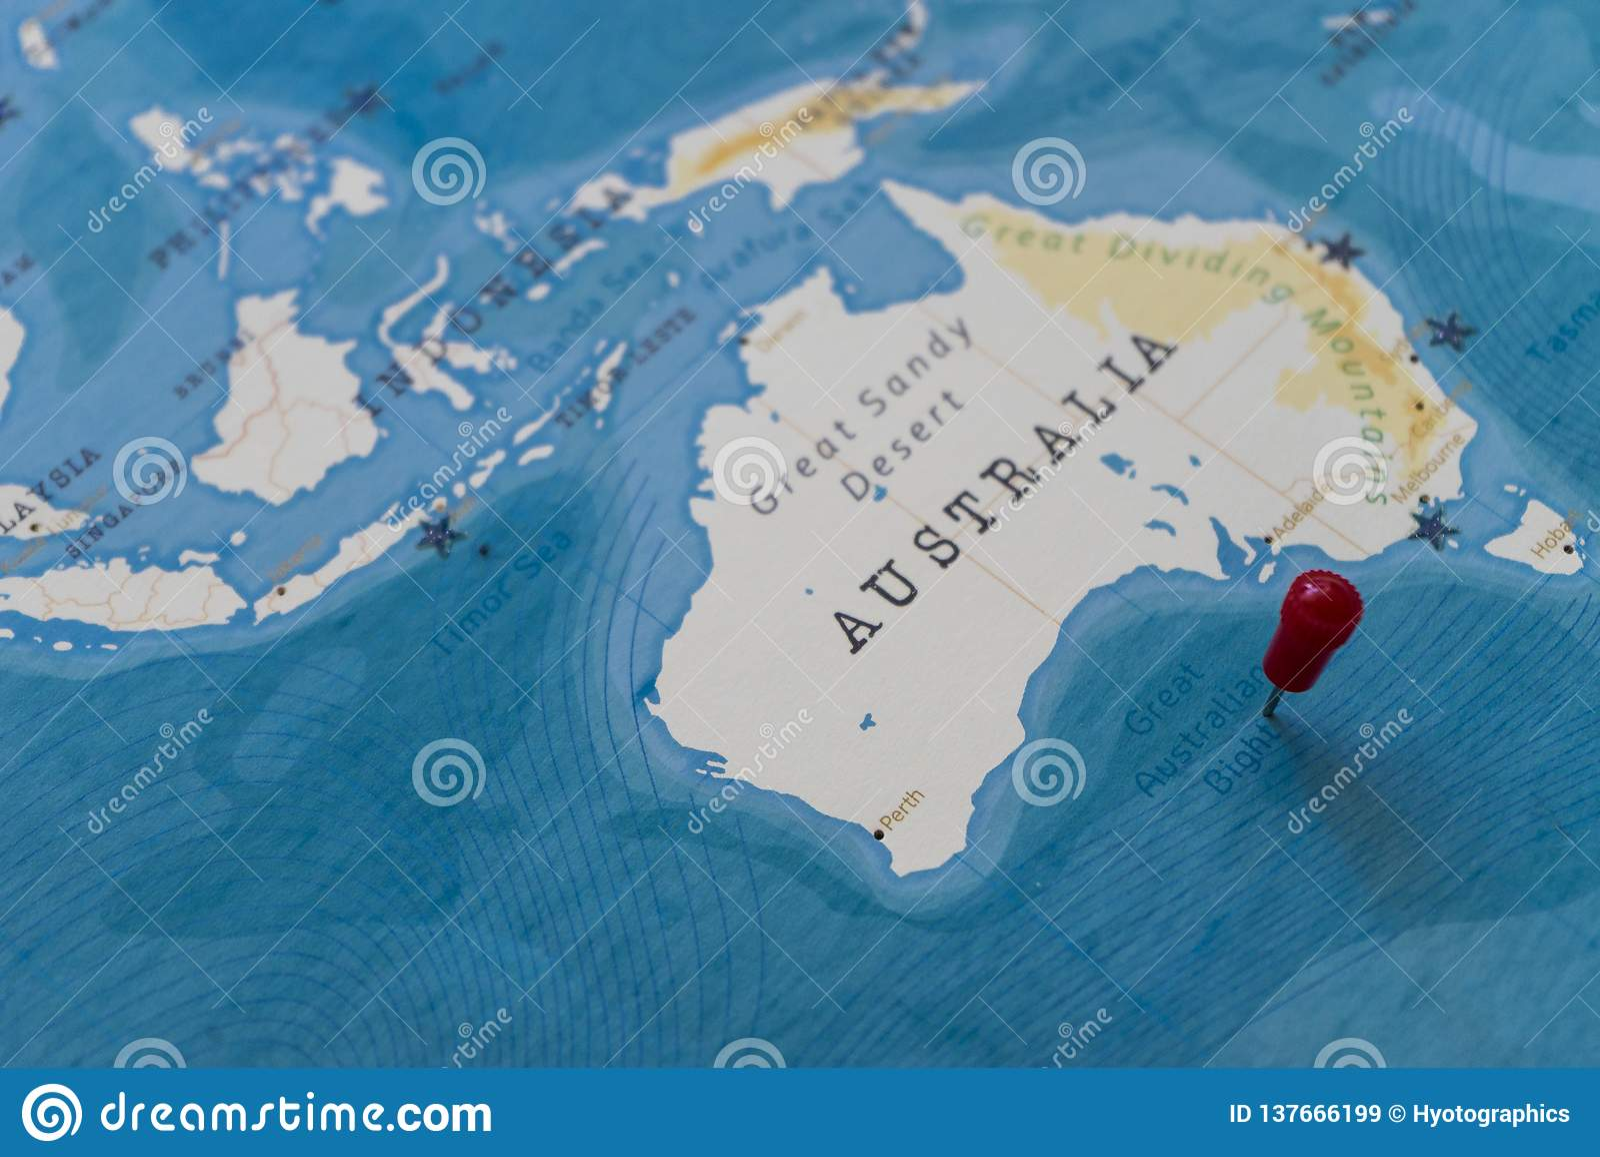 Australia Map Great Australian Bight.A Pin On Great Australian Bight In The World Map Stock Image